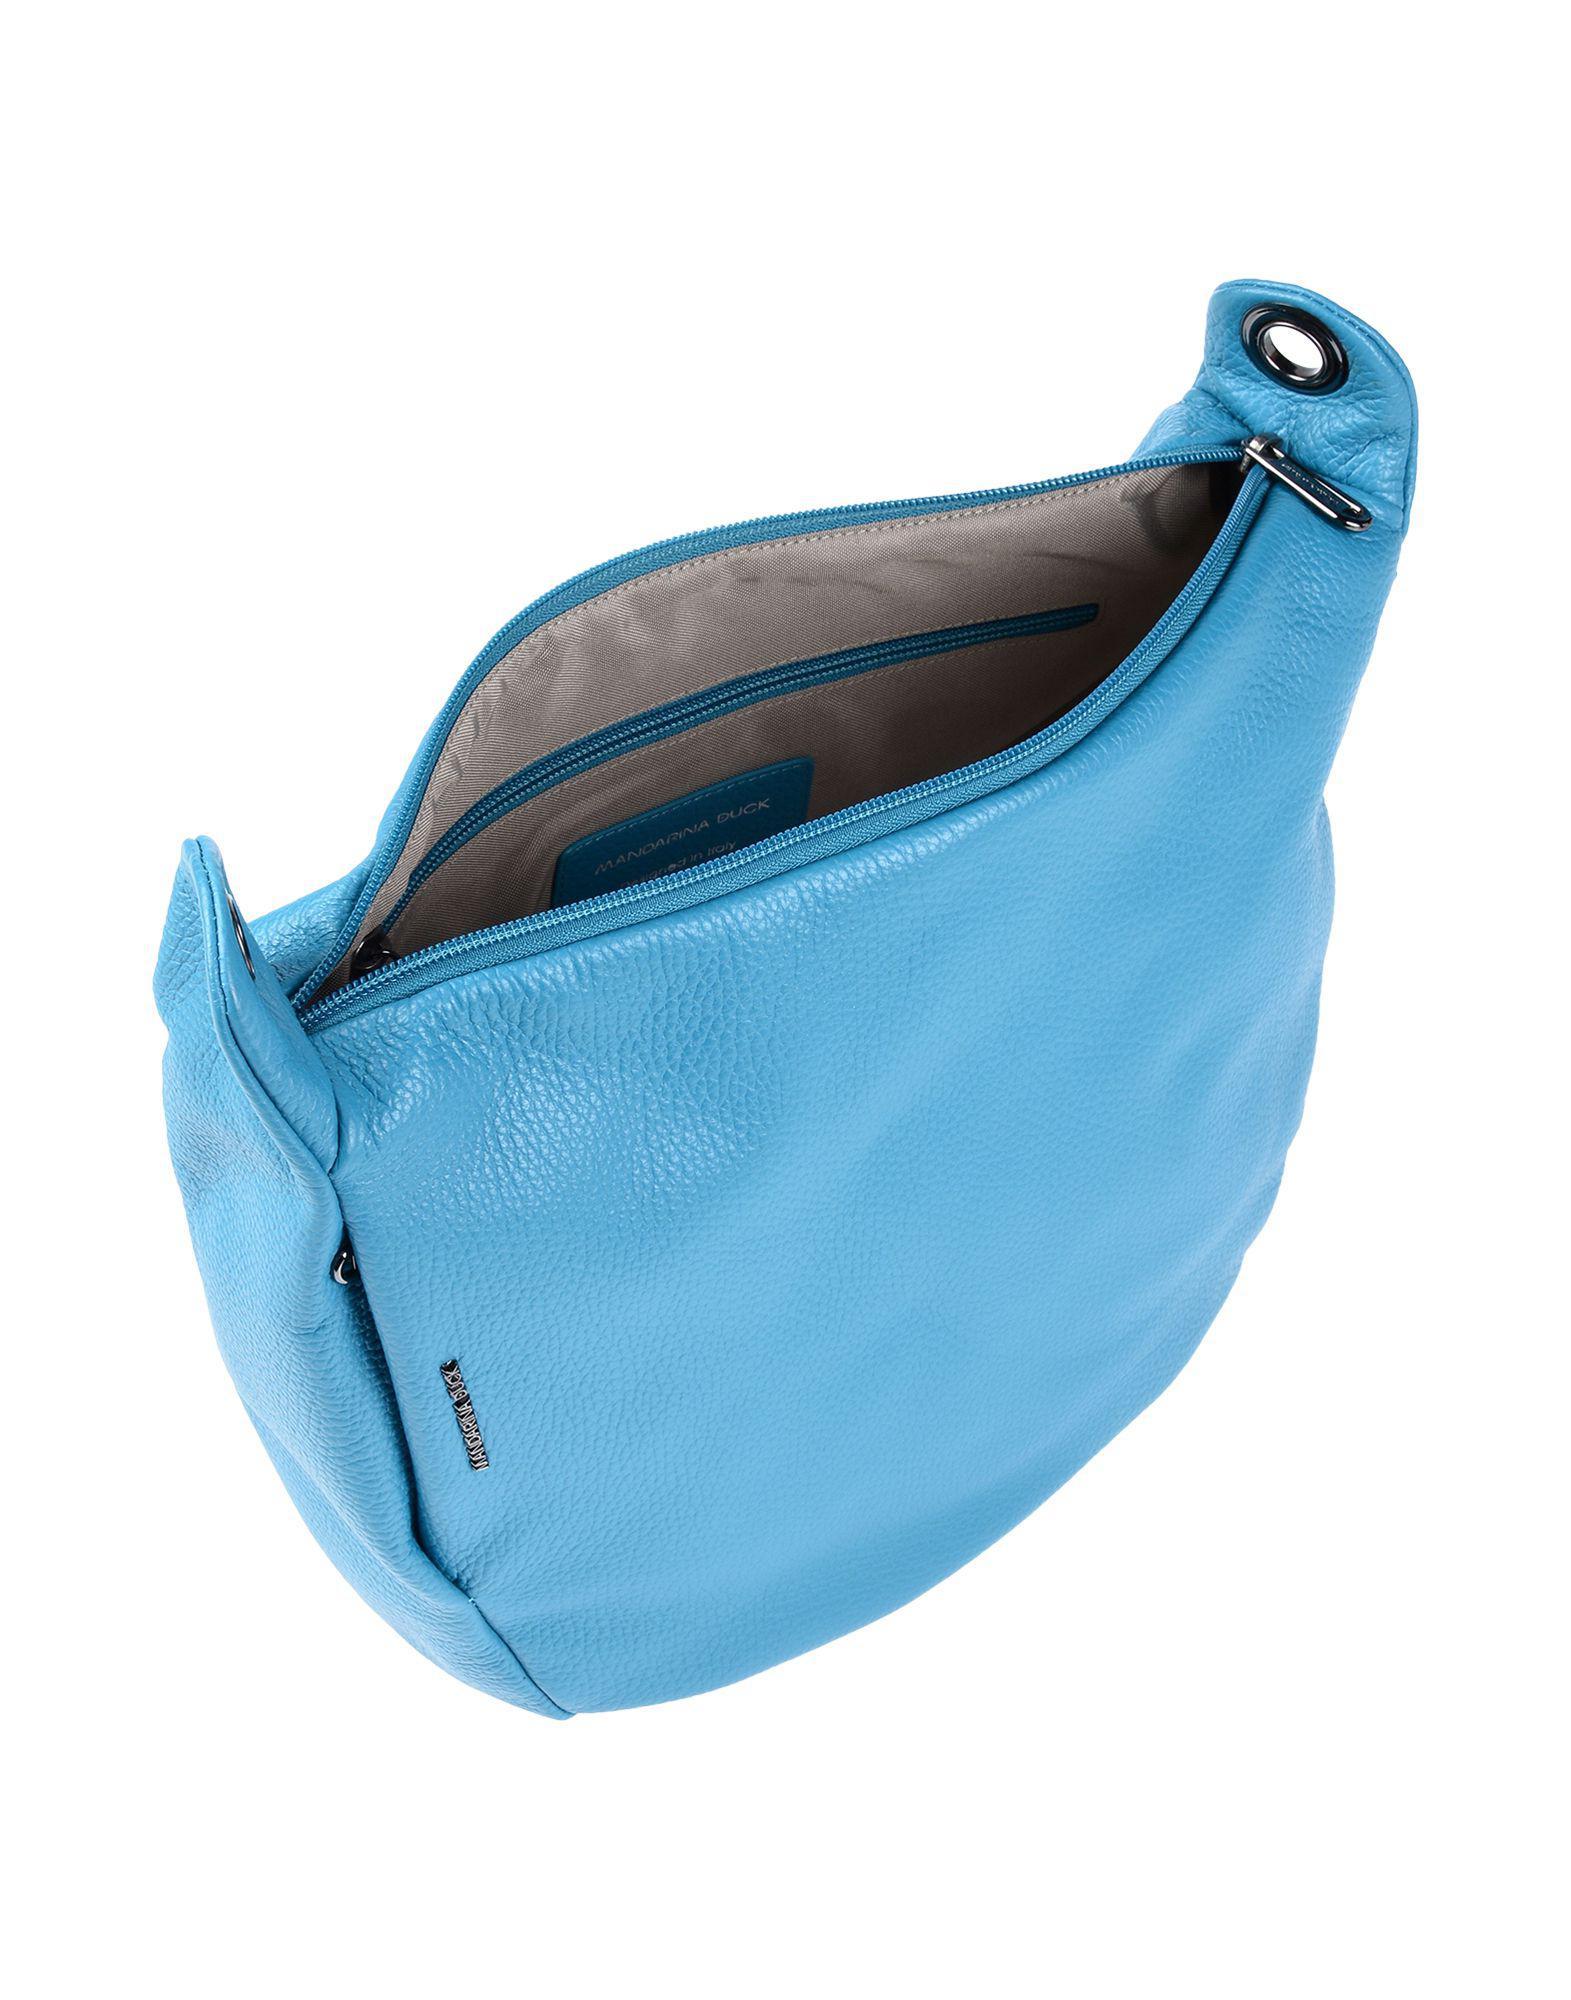 29be7ea9d Mandarina Duck - Blue Bolso con bandolera - Lyst. Ver en pantalla completa